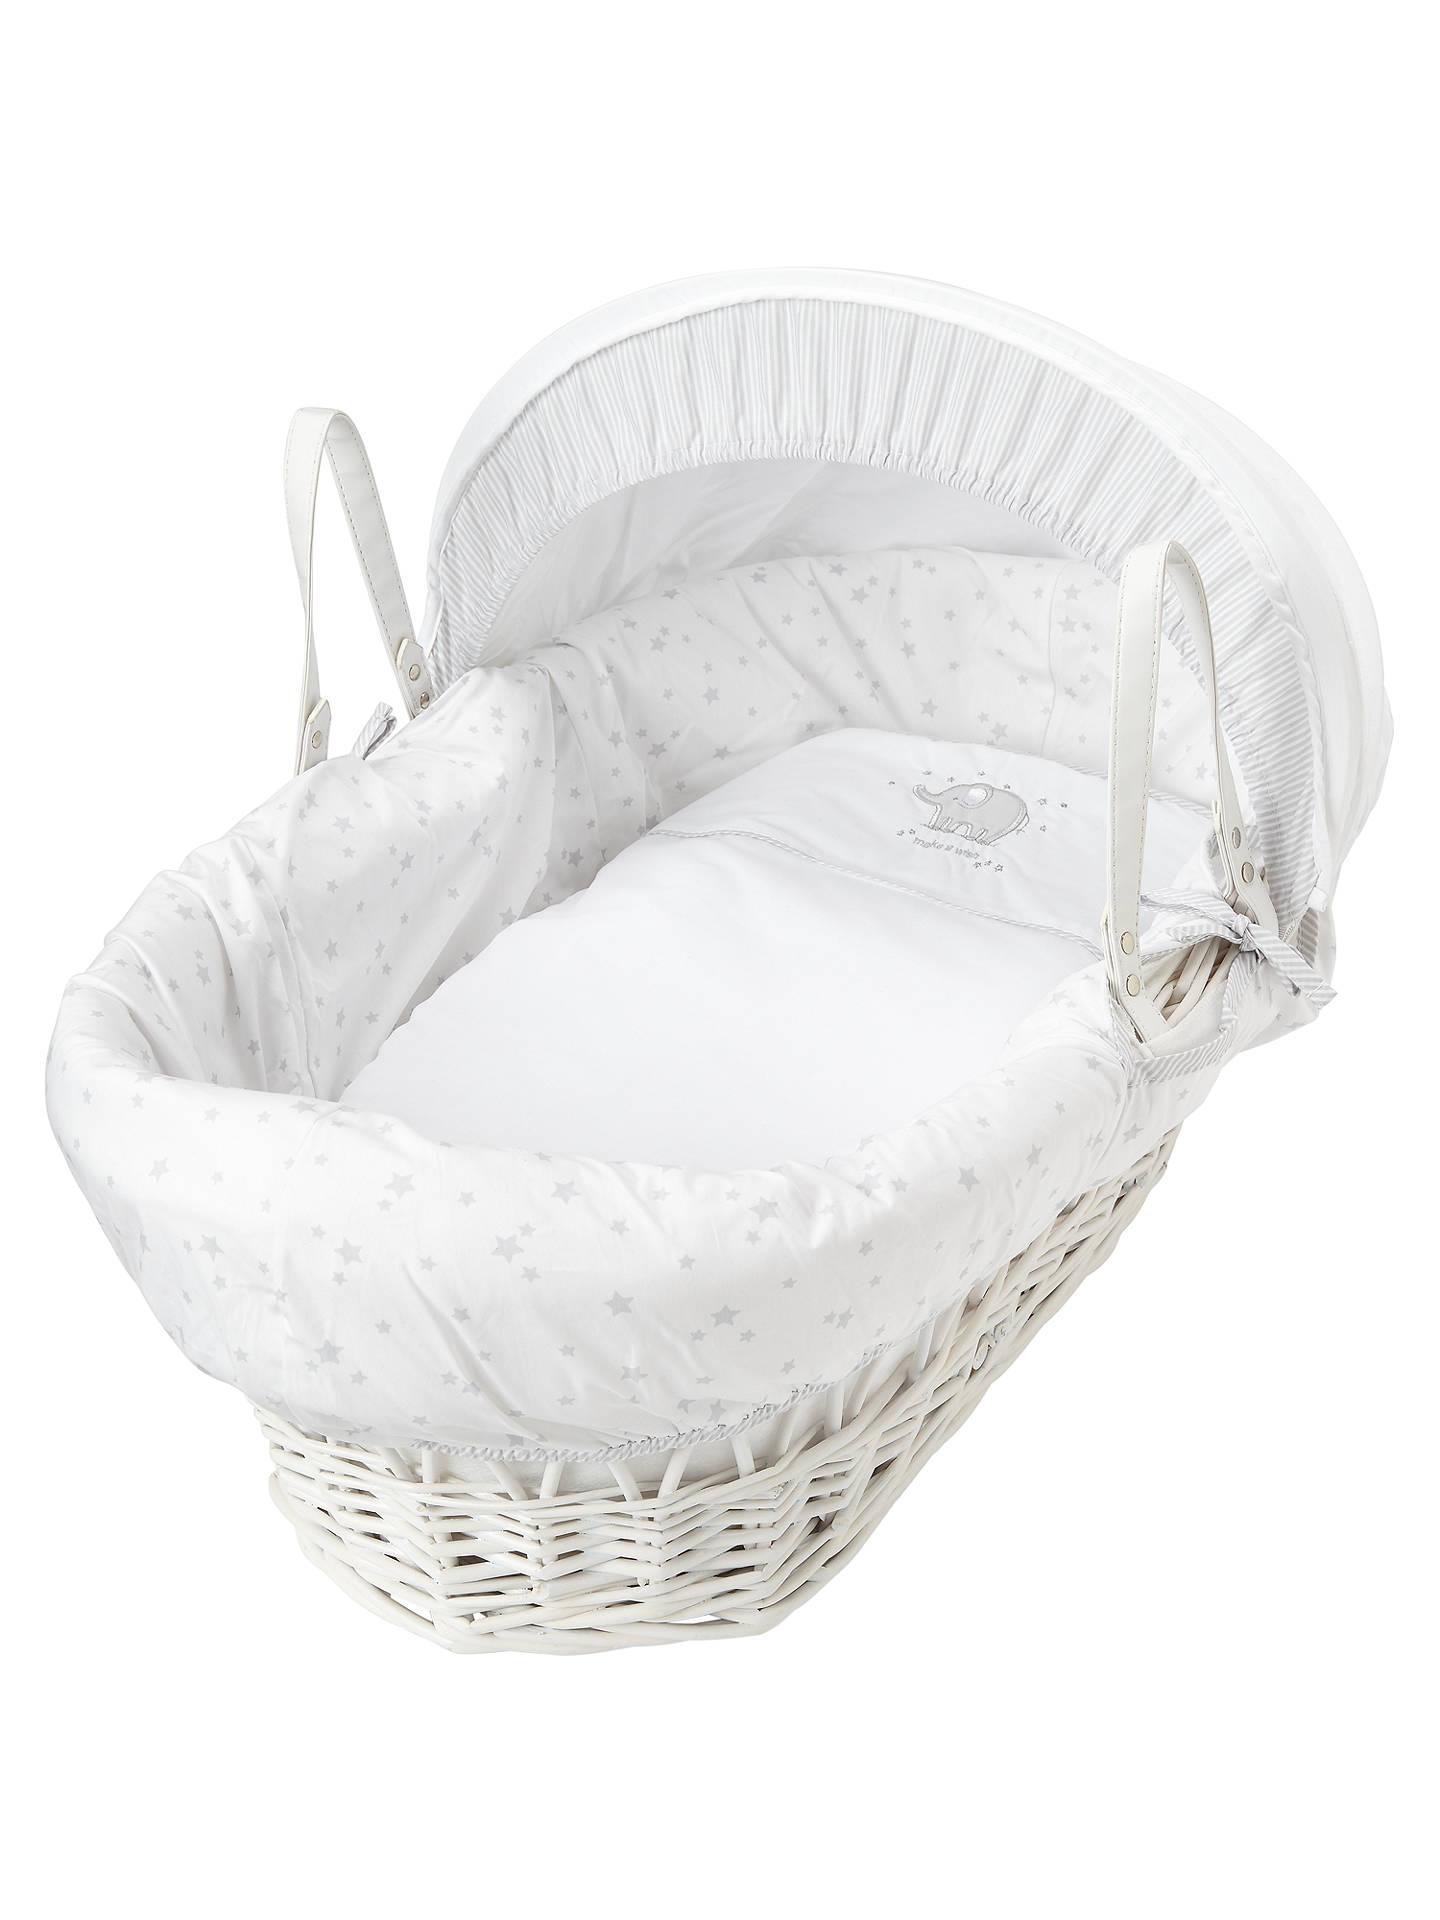 White /& Cream Teddy Moses Basket For New Born Baby Girl Boy Nursery Bed